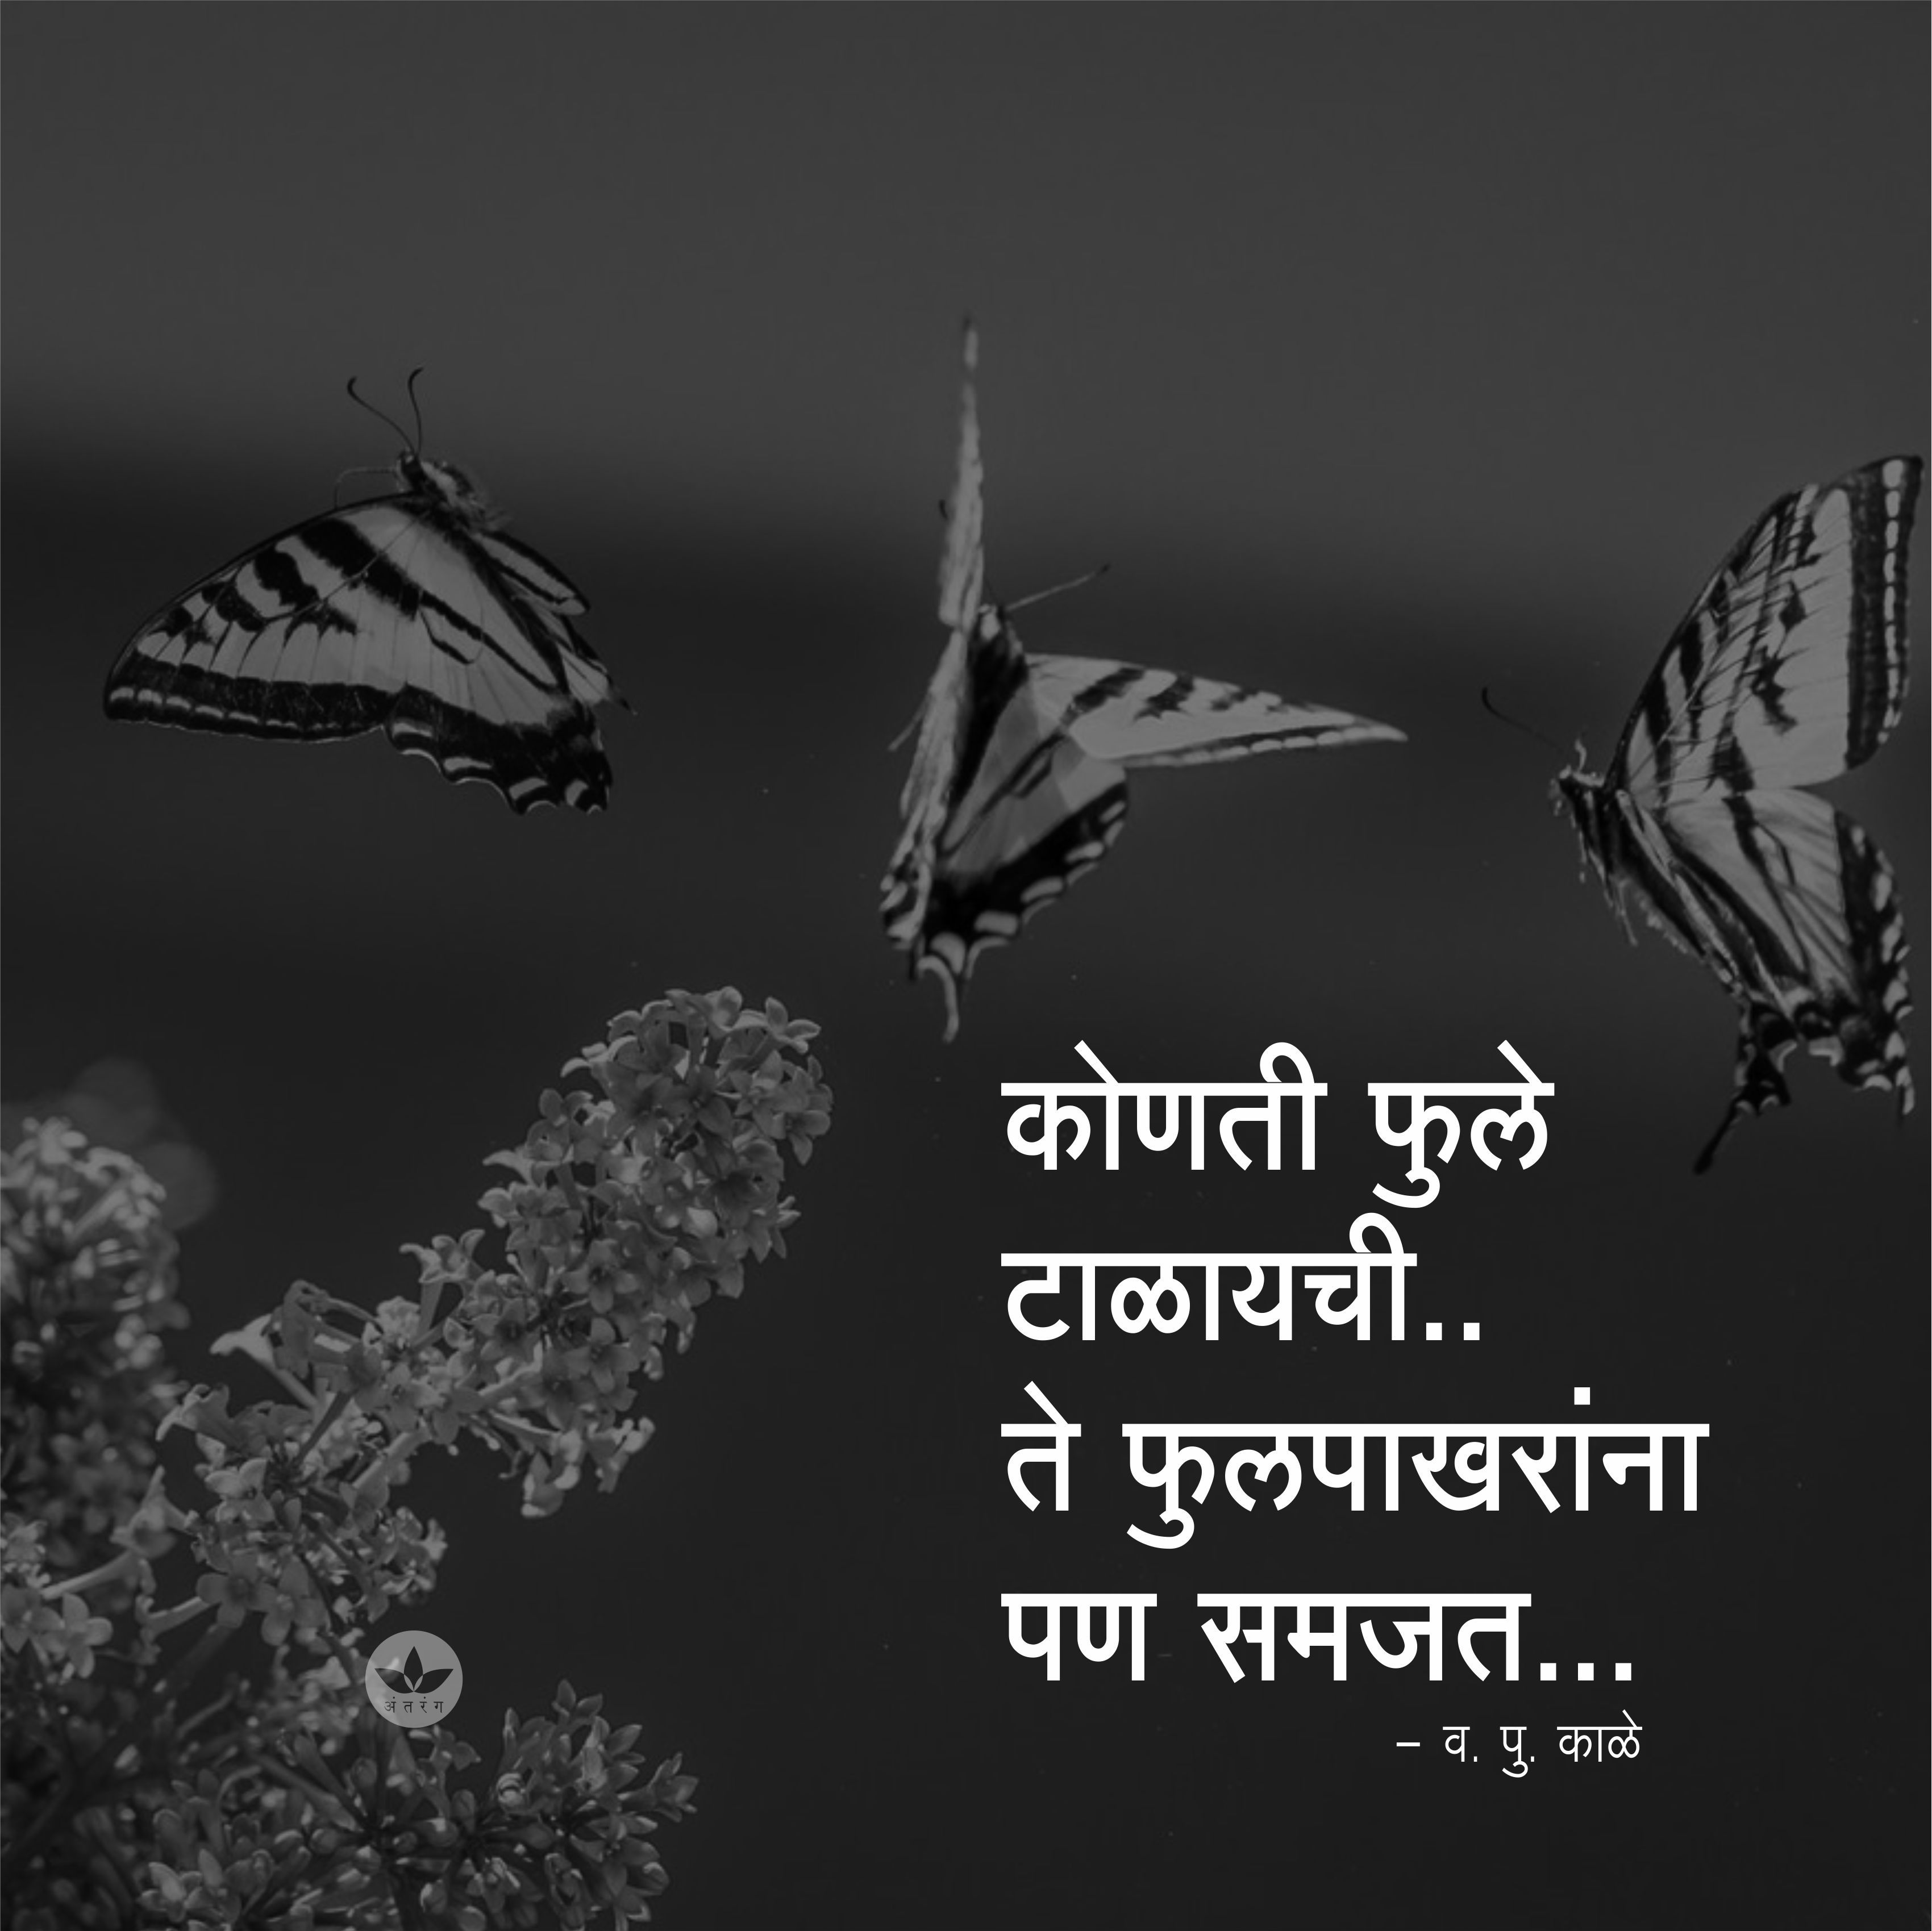 Pin By Omkar Kulkarni On मर ठ स ह त य Marathi